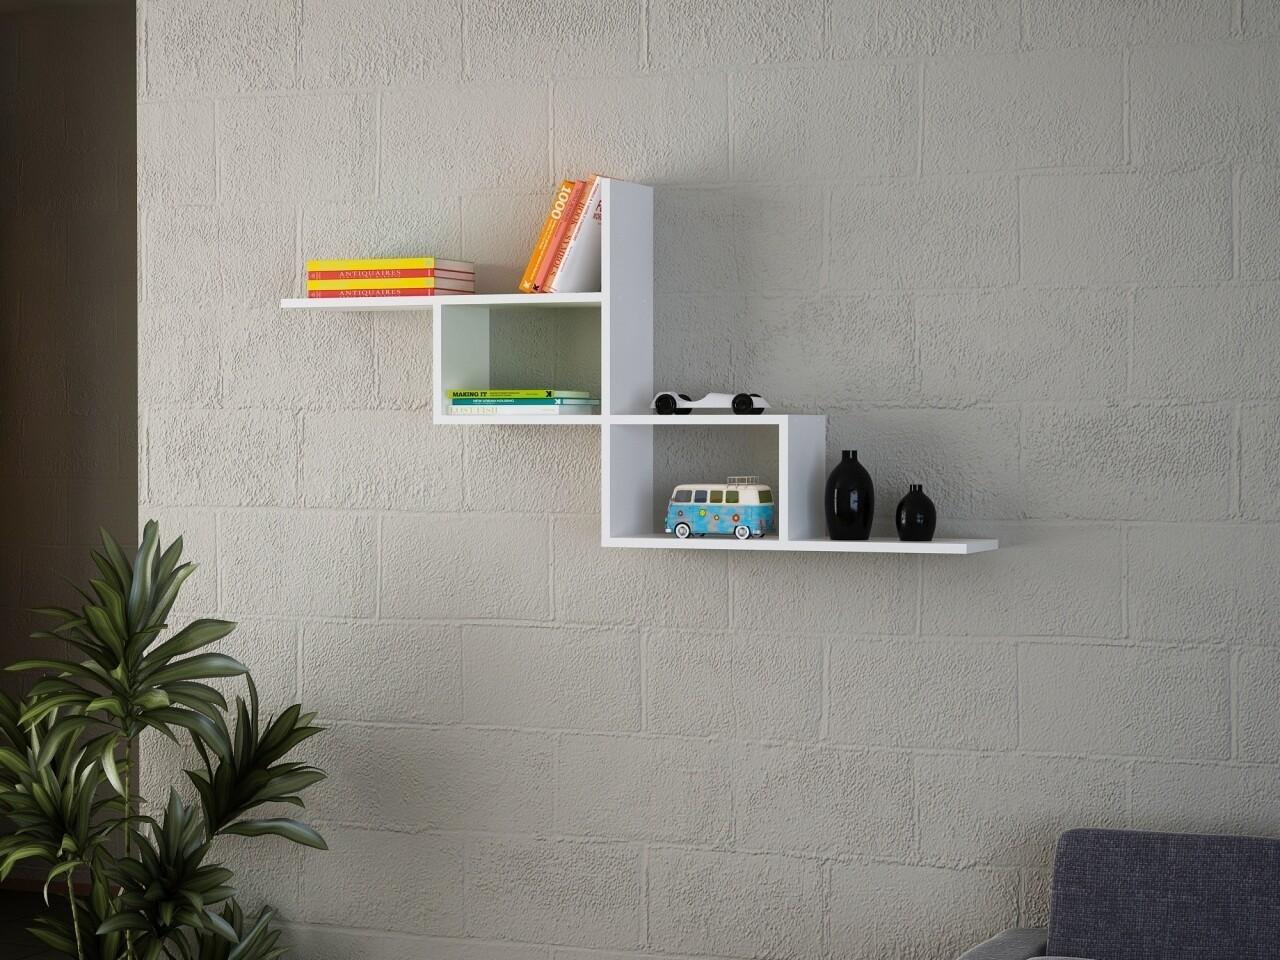 Raft pentru perete, Wooden Art, White, 144.6x71.4x22 cm